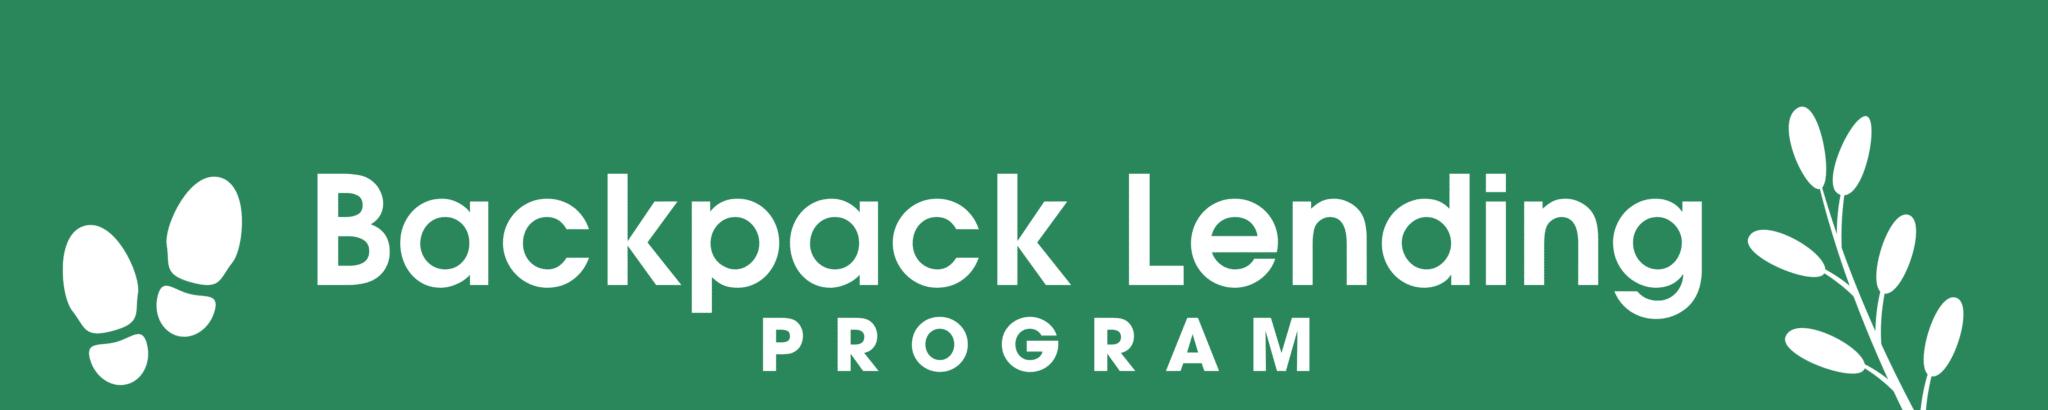 "Banner image that states ""Backpack Lending Program"""